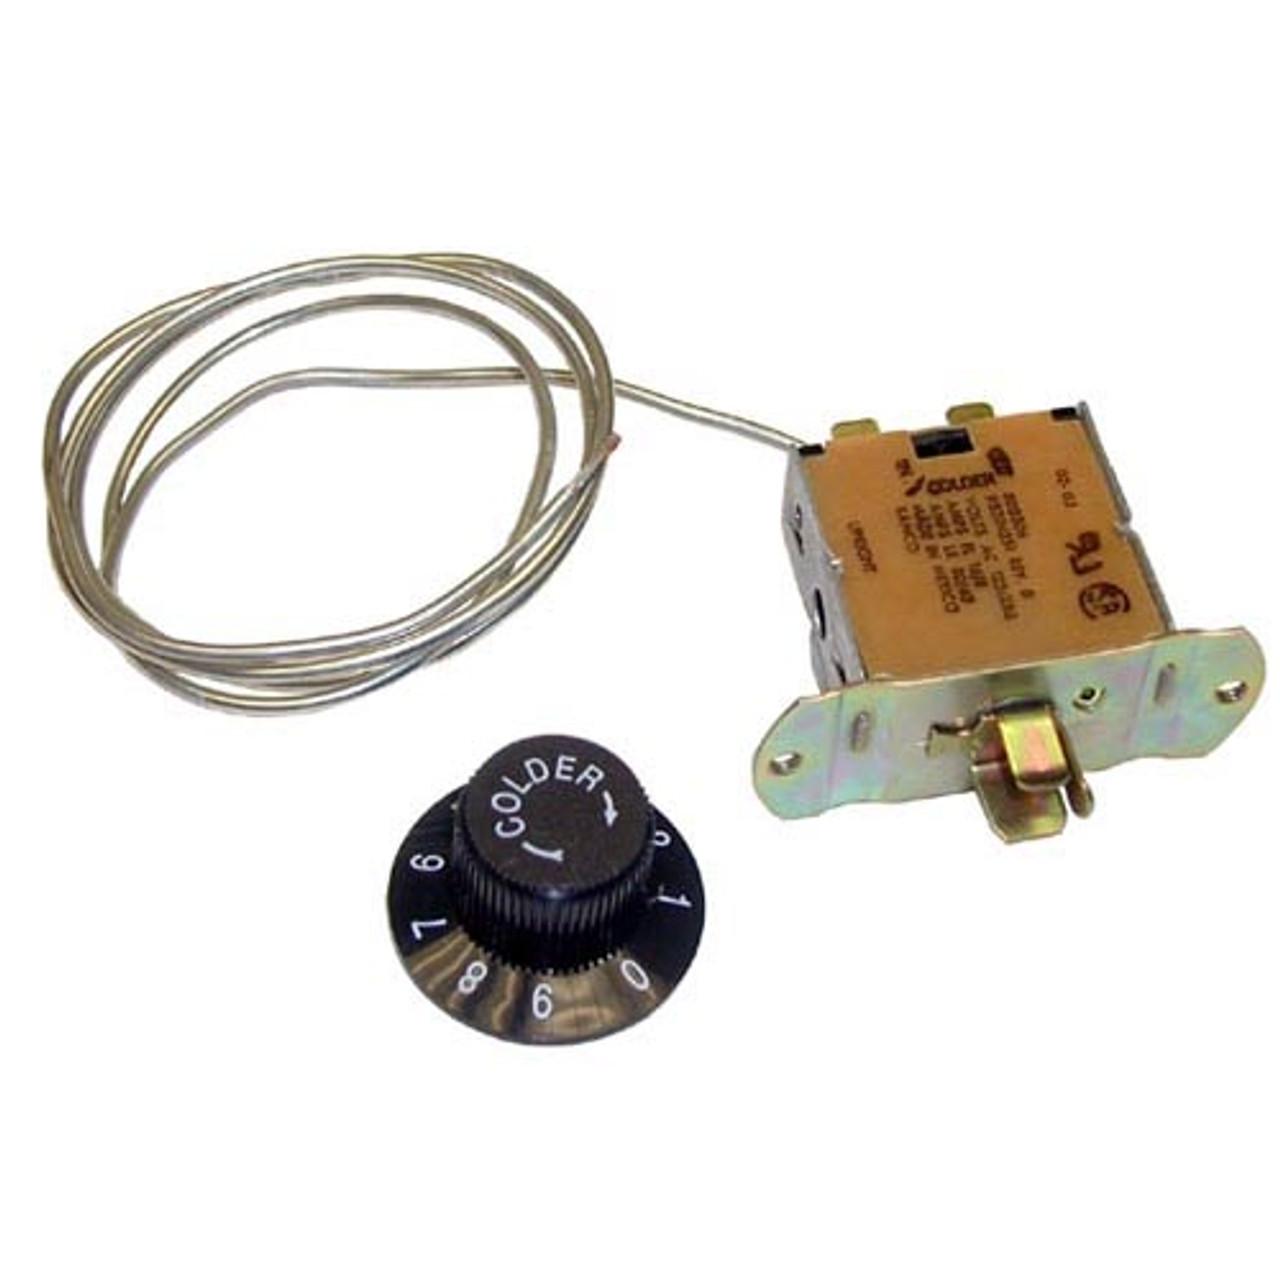 GLENCO SP64-14 COOLER CONTROL